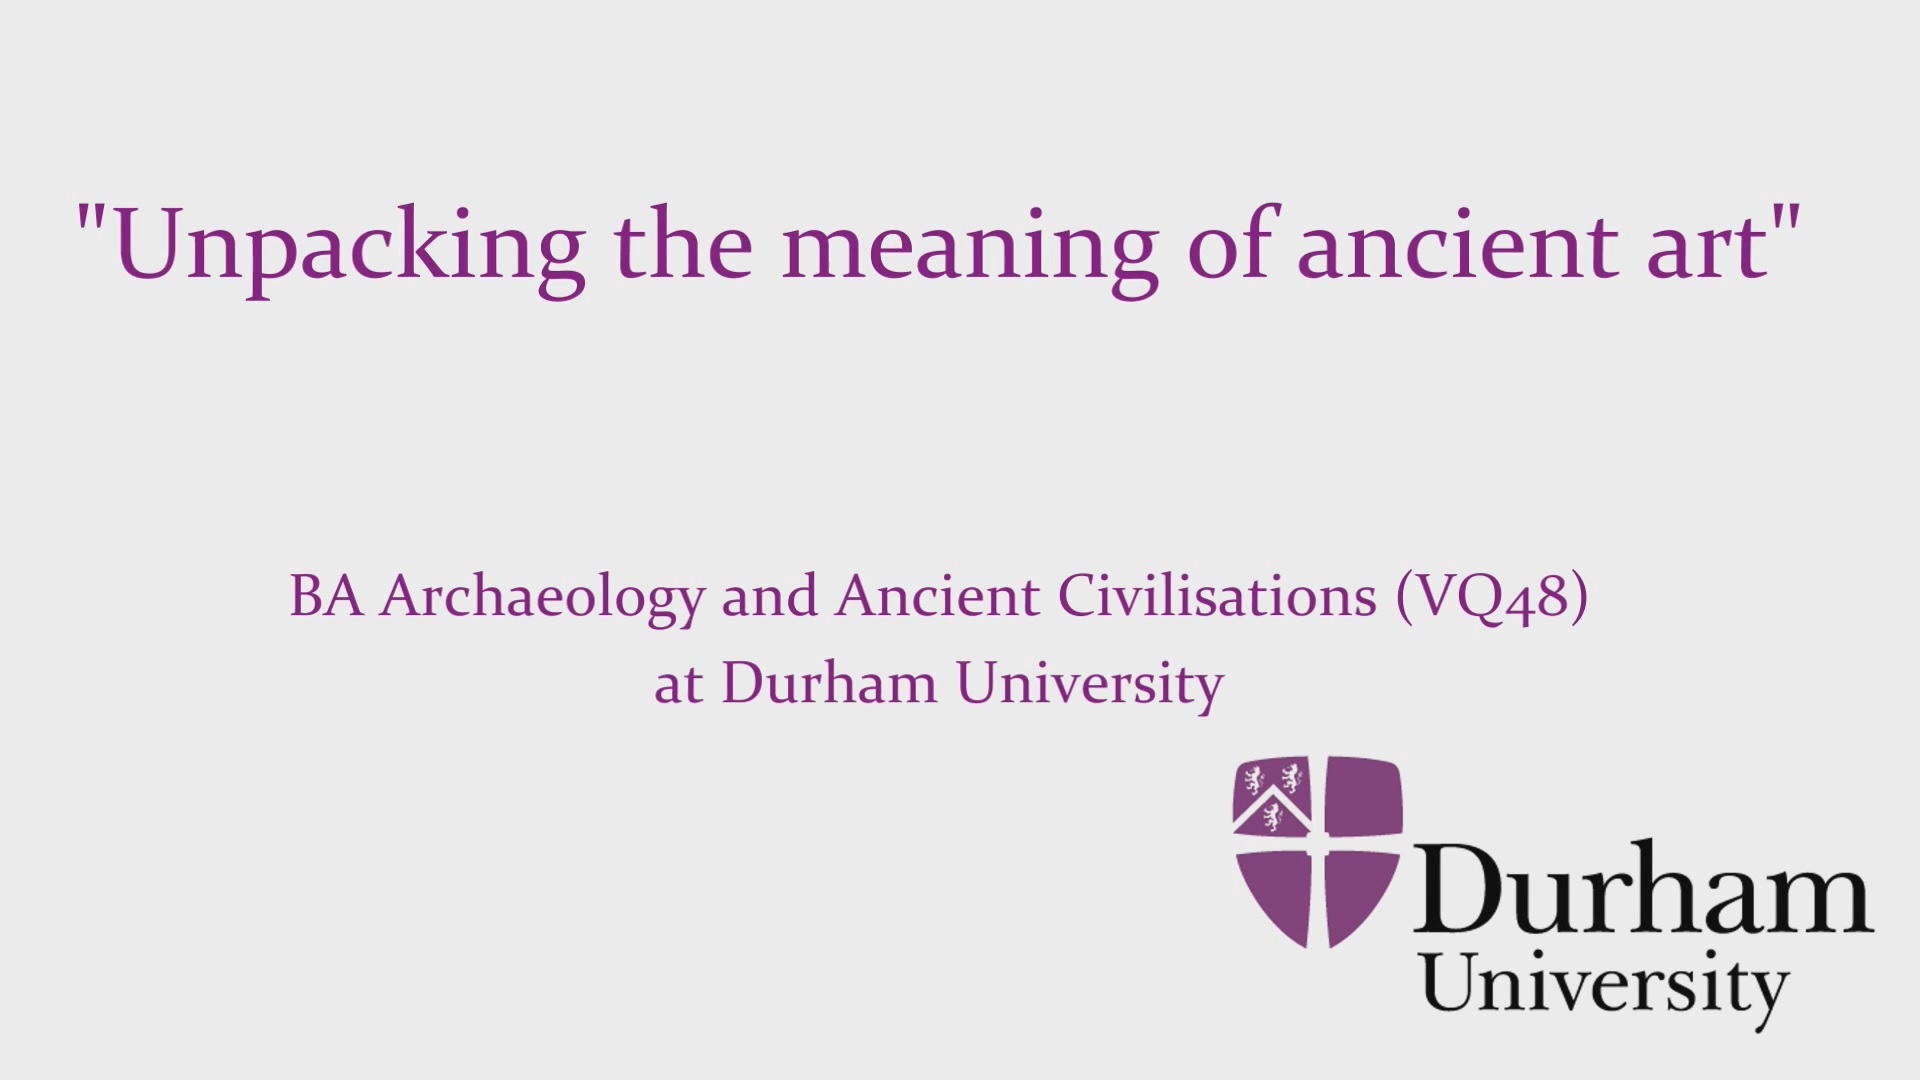 BA Archaeology and Ancient Civilisations at Durham University